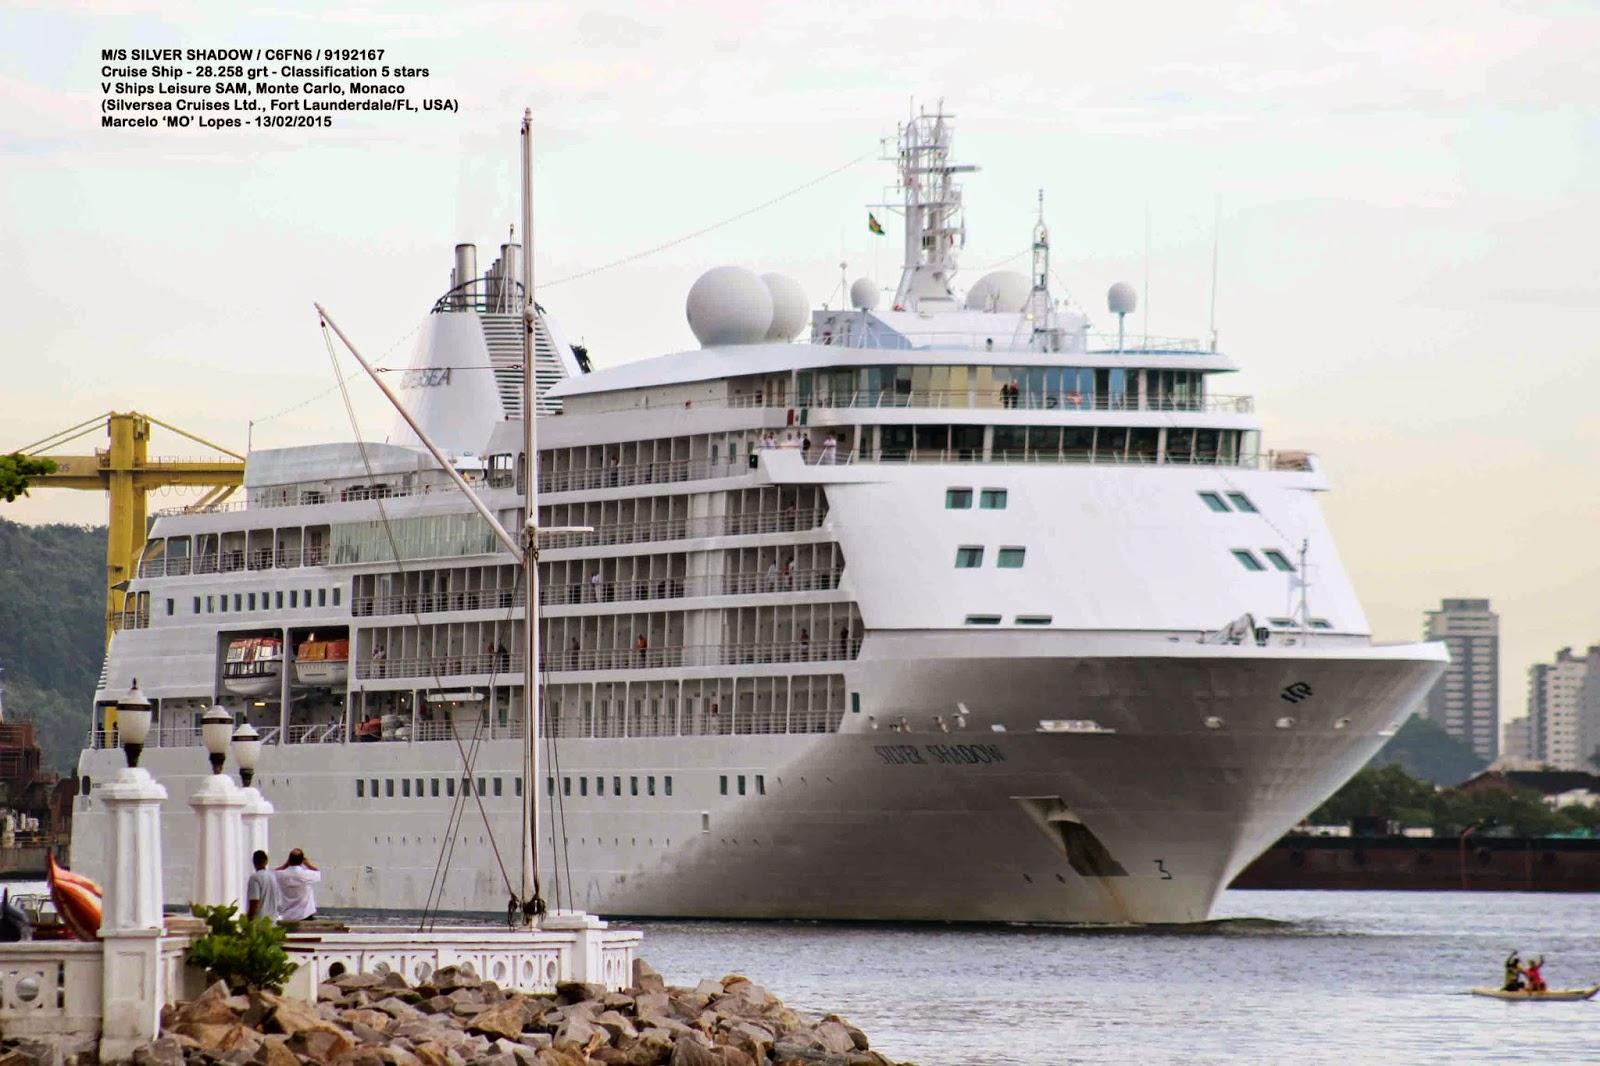 Santos shiplovers m s silver shadow c6fn6 cruzeiro de for Mariotti arredamenti srl genova